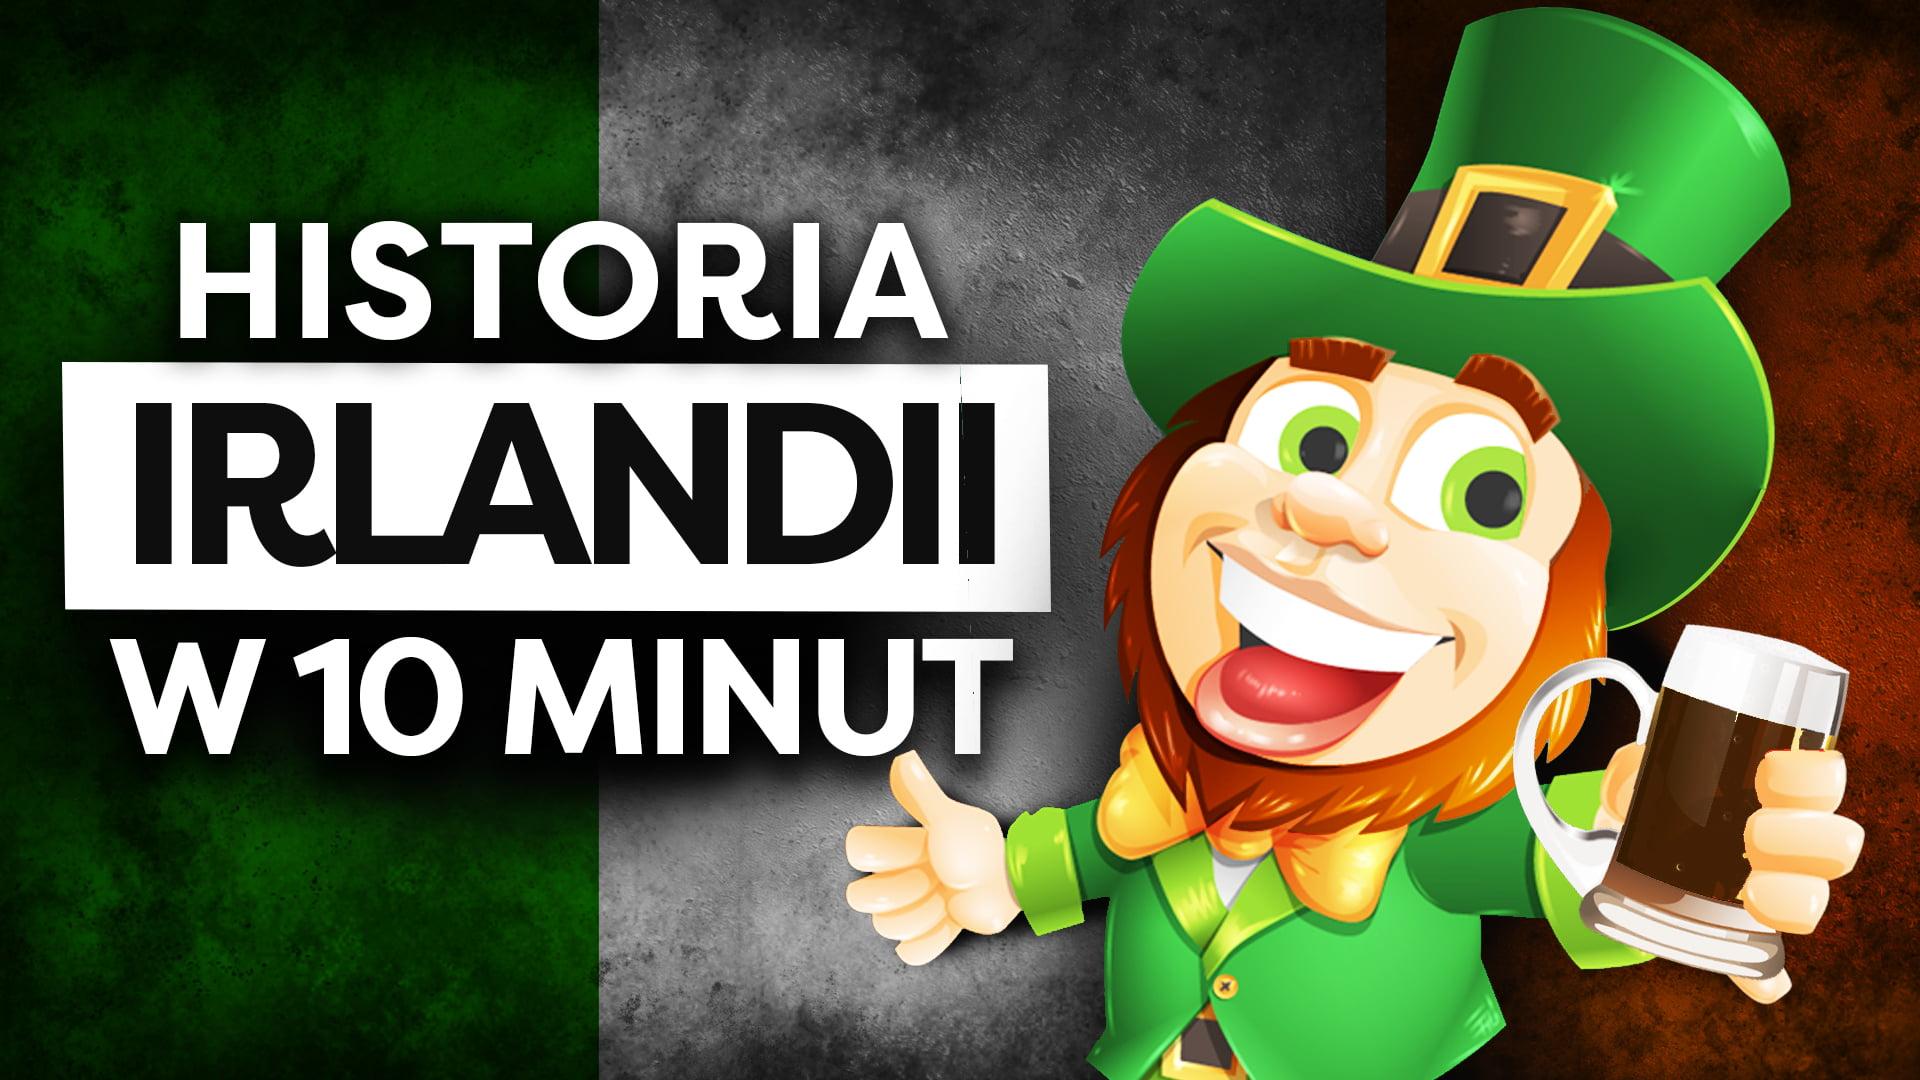 irlandia, historia irlandii